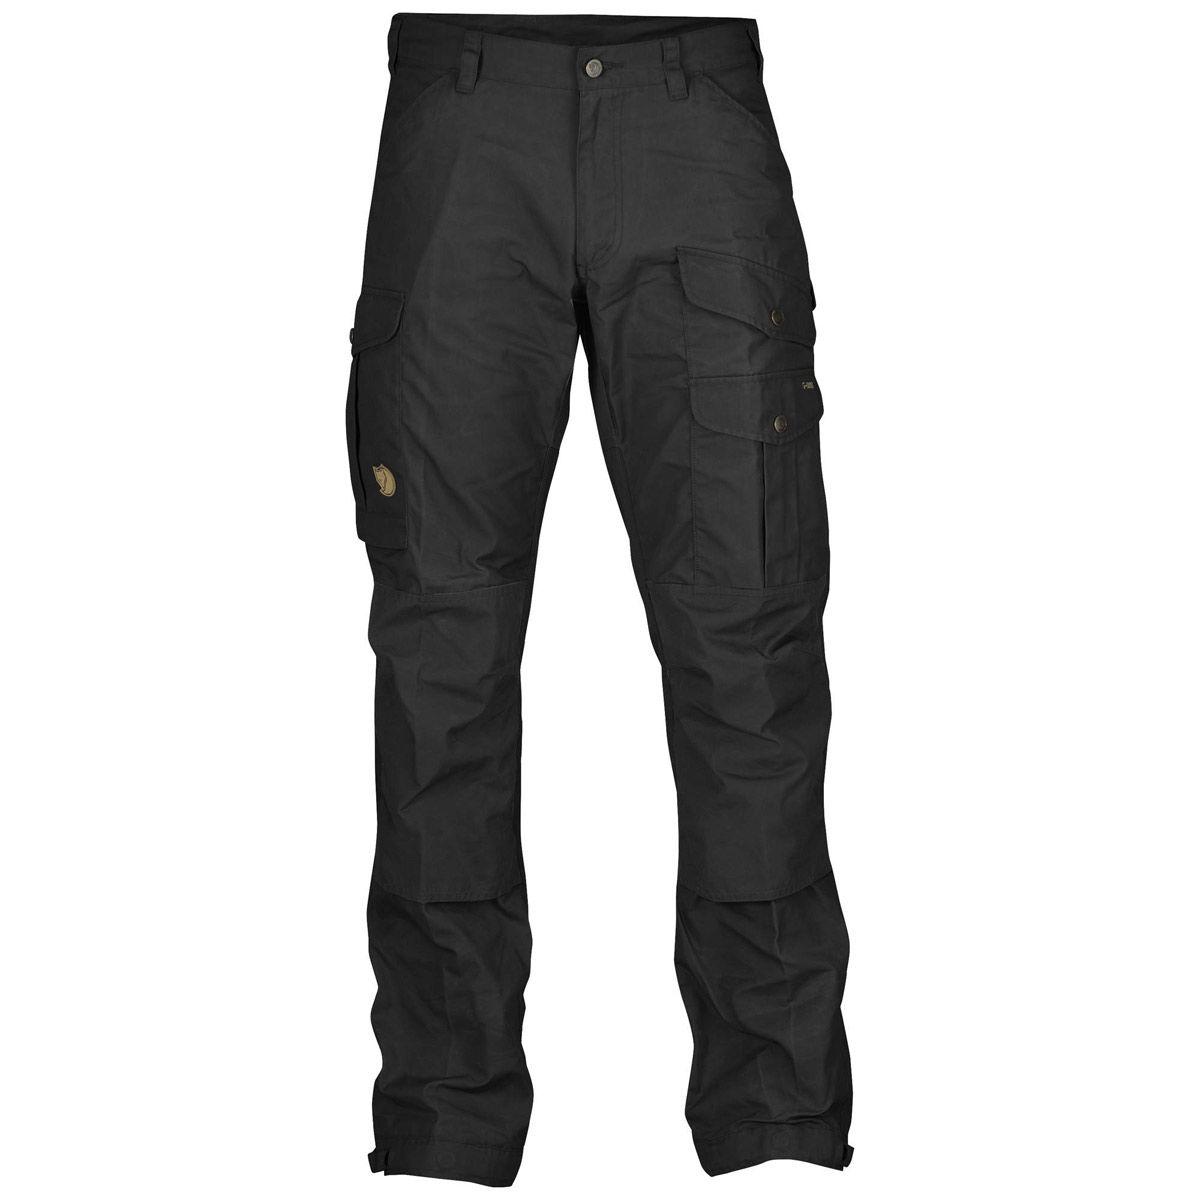 Fjallraven Vidda Pro Regular Trousers - Black/Black